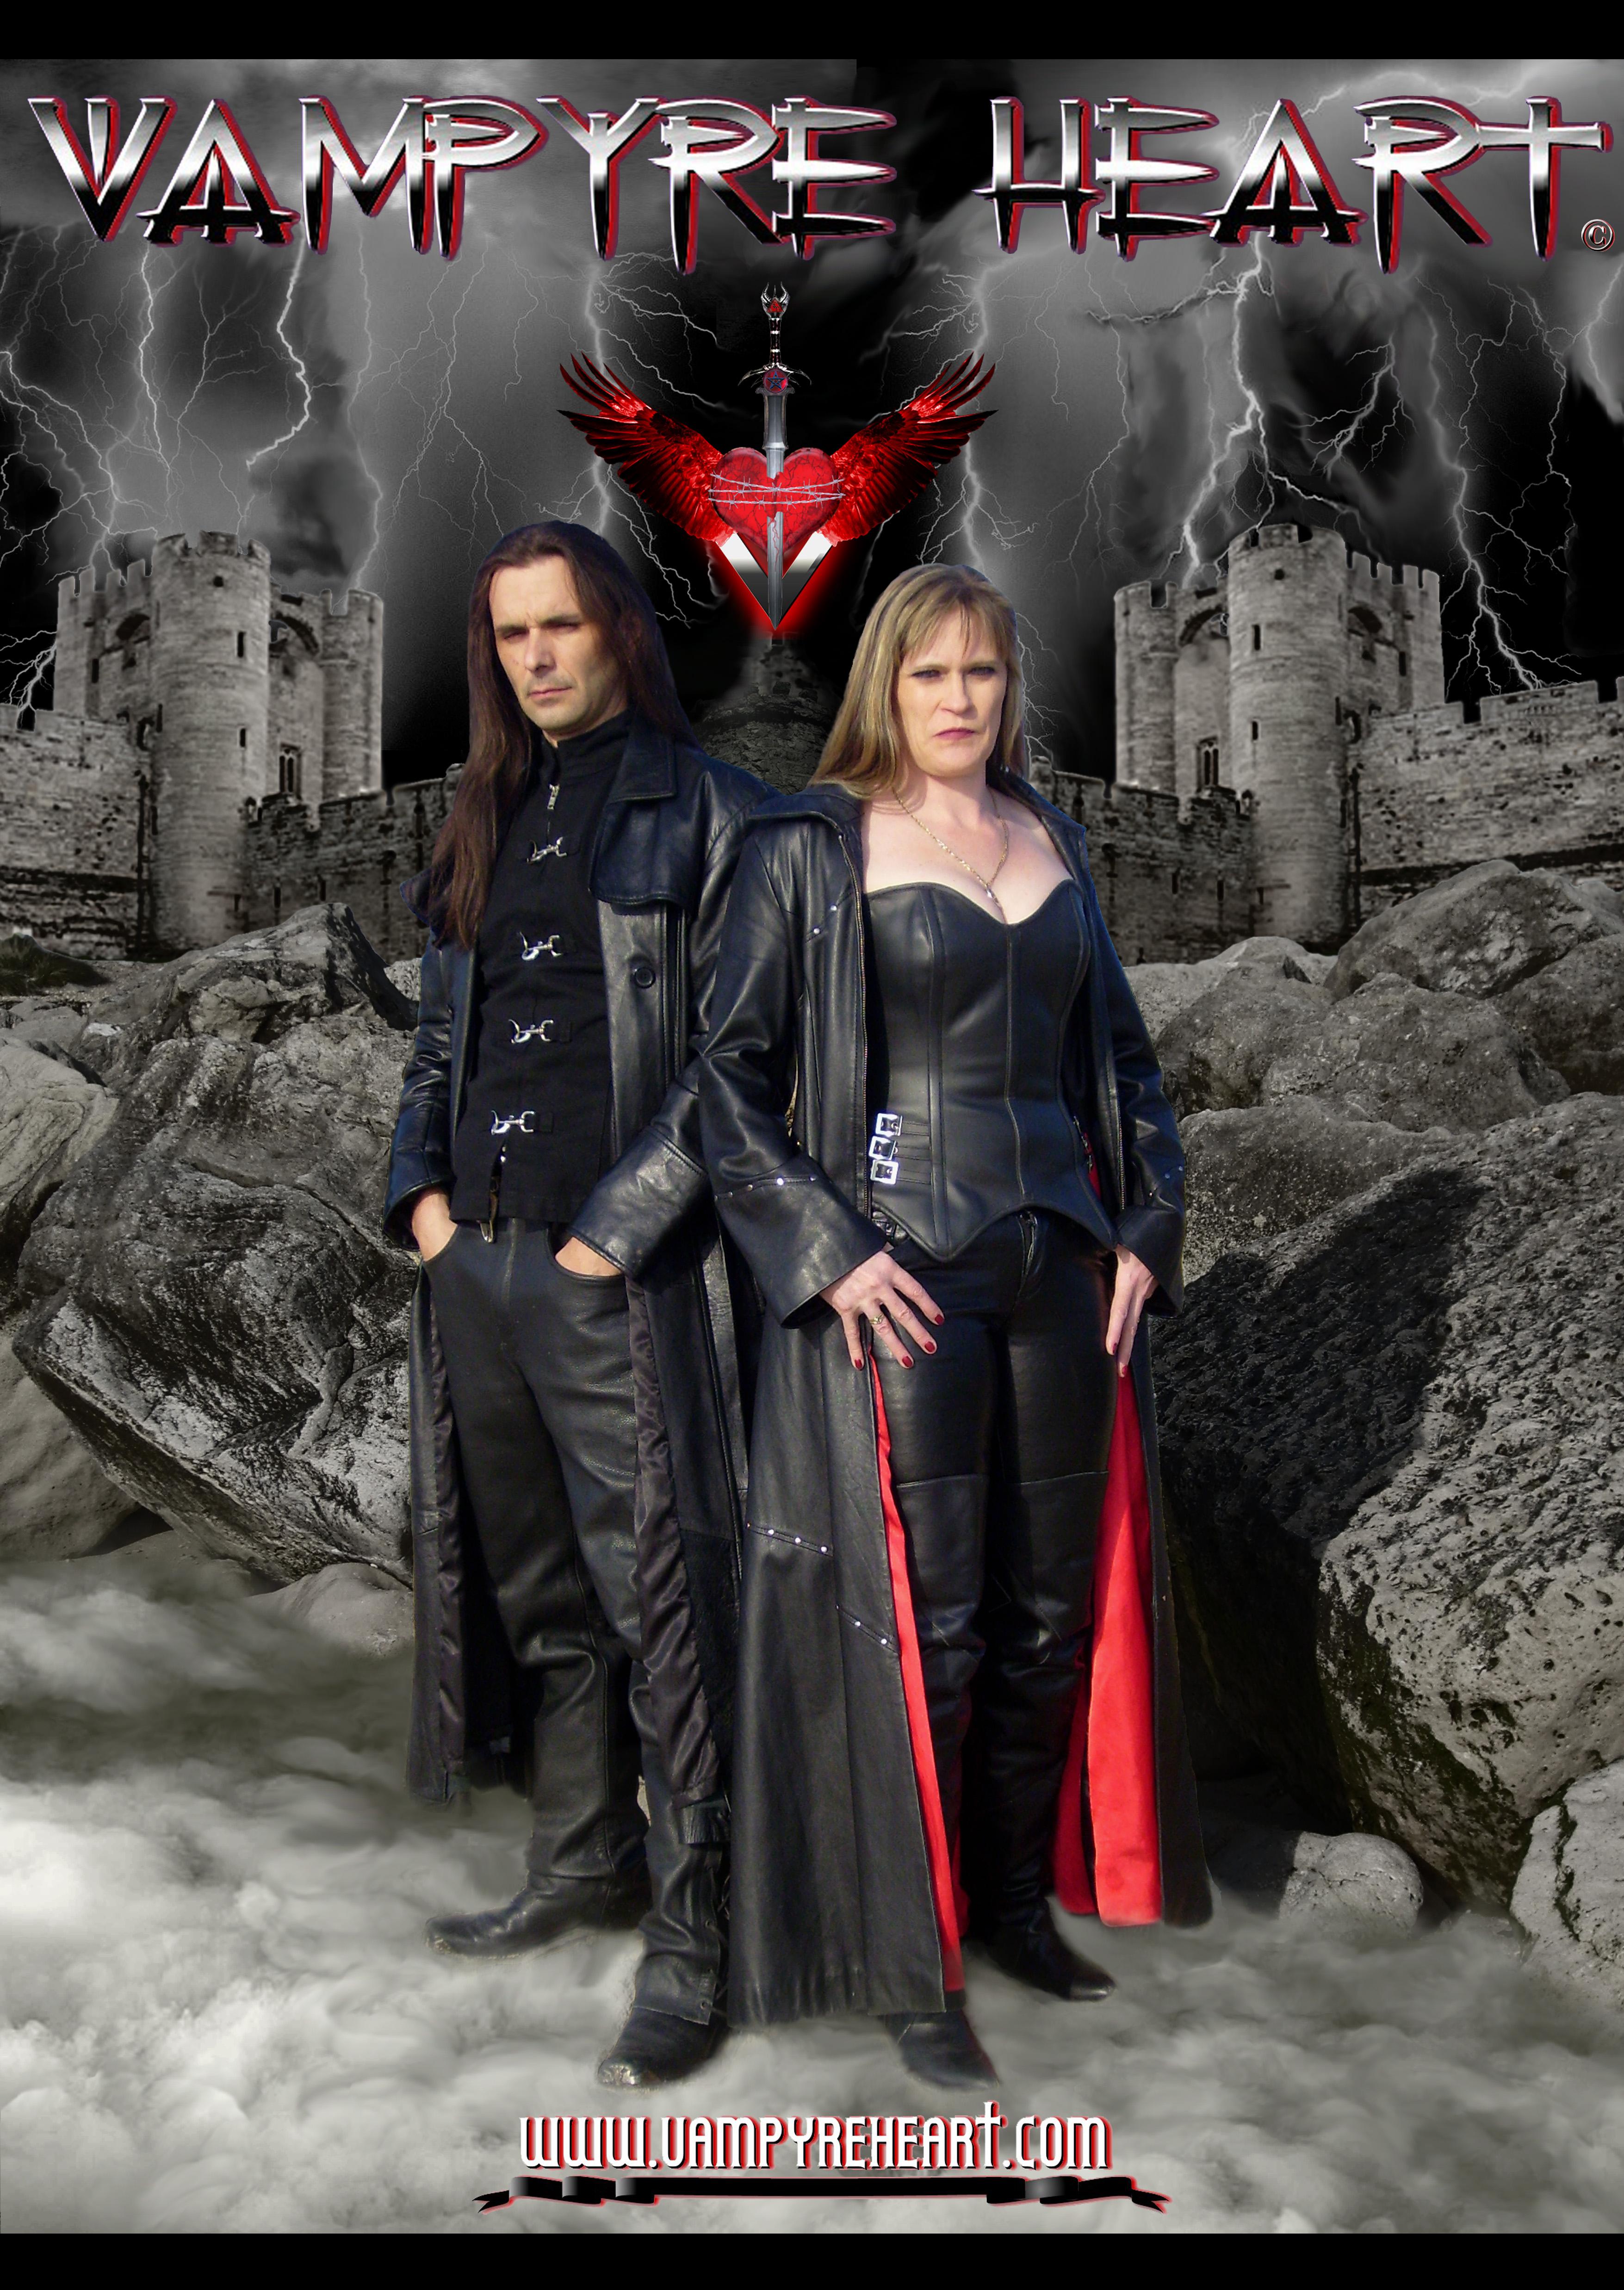 Vampyre Heart Gallery